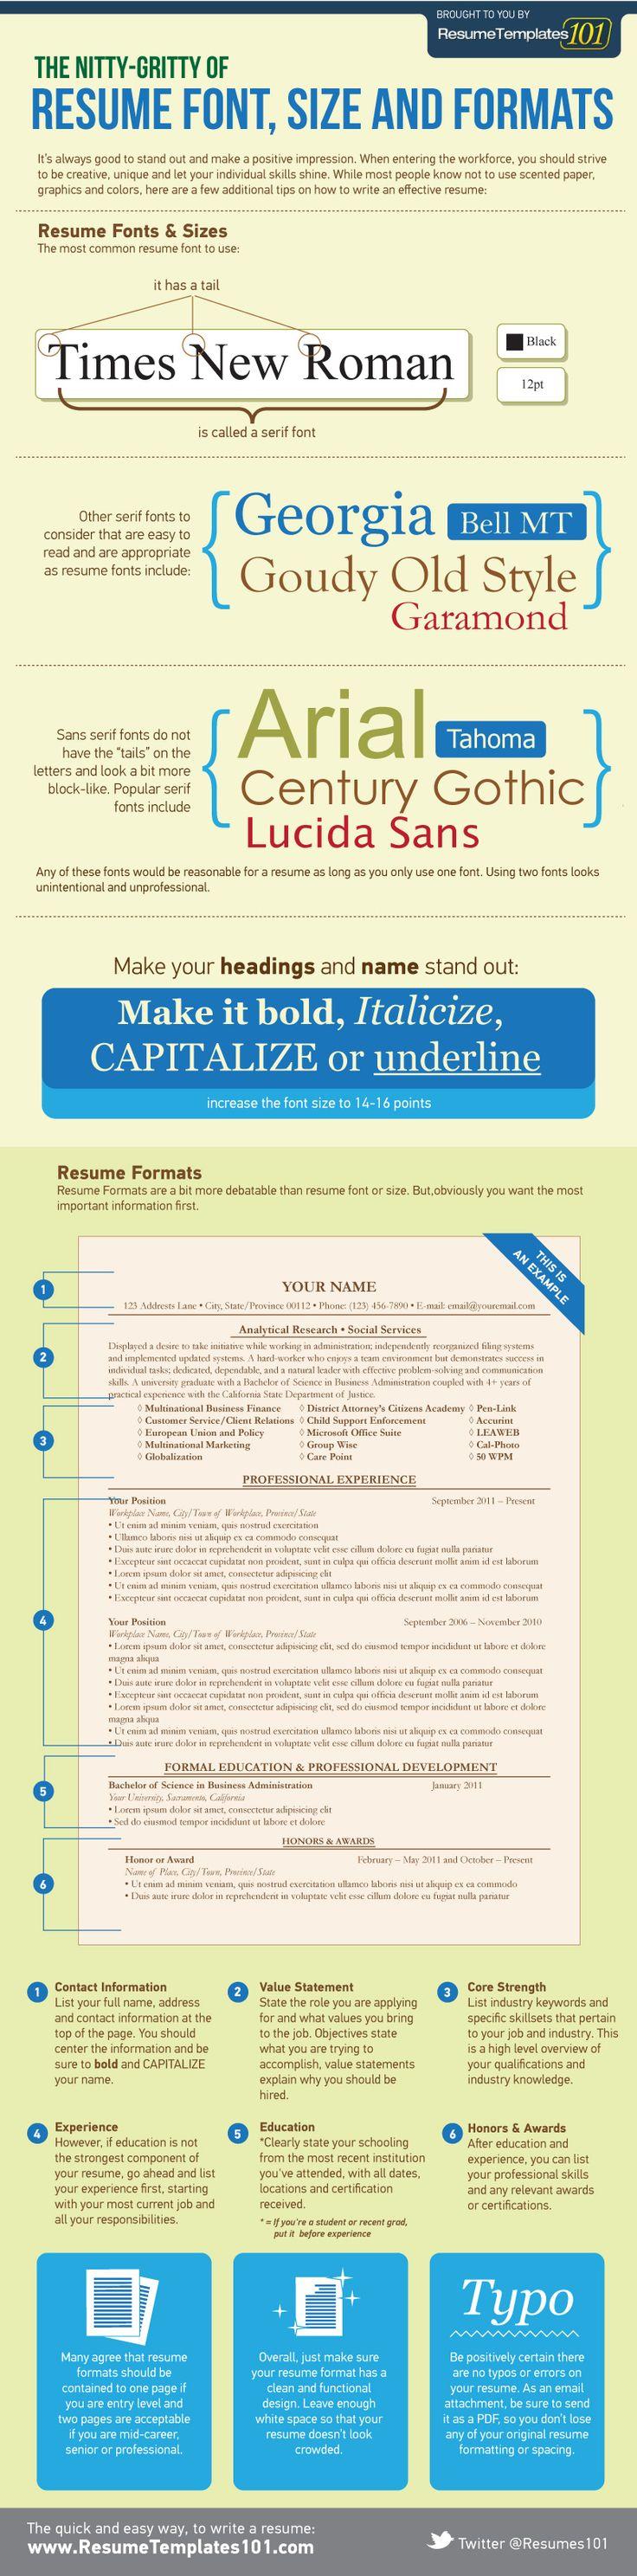 Los mejores formatos de texto para tu Curriculum #infografia #infographic #design